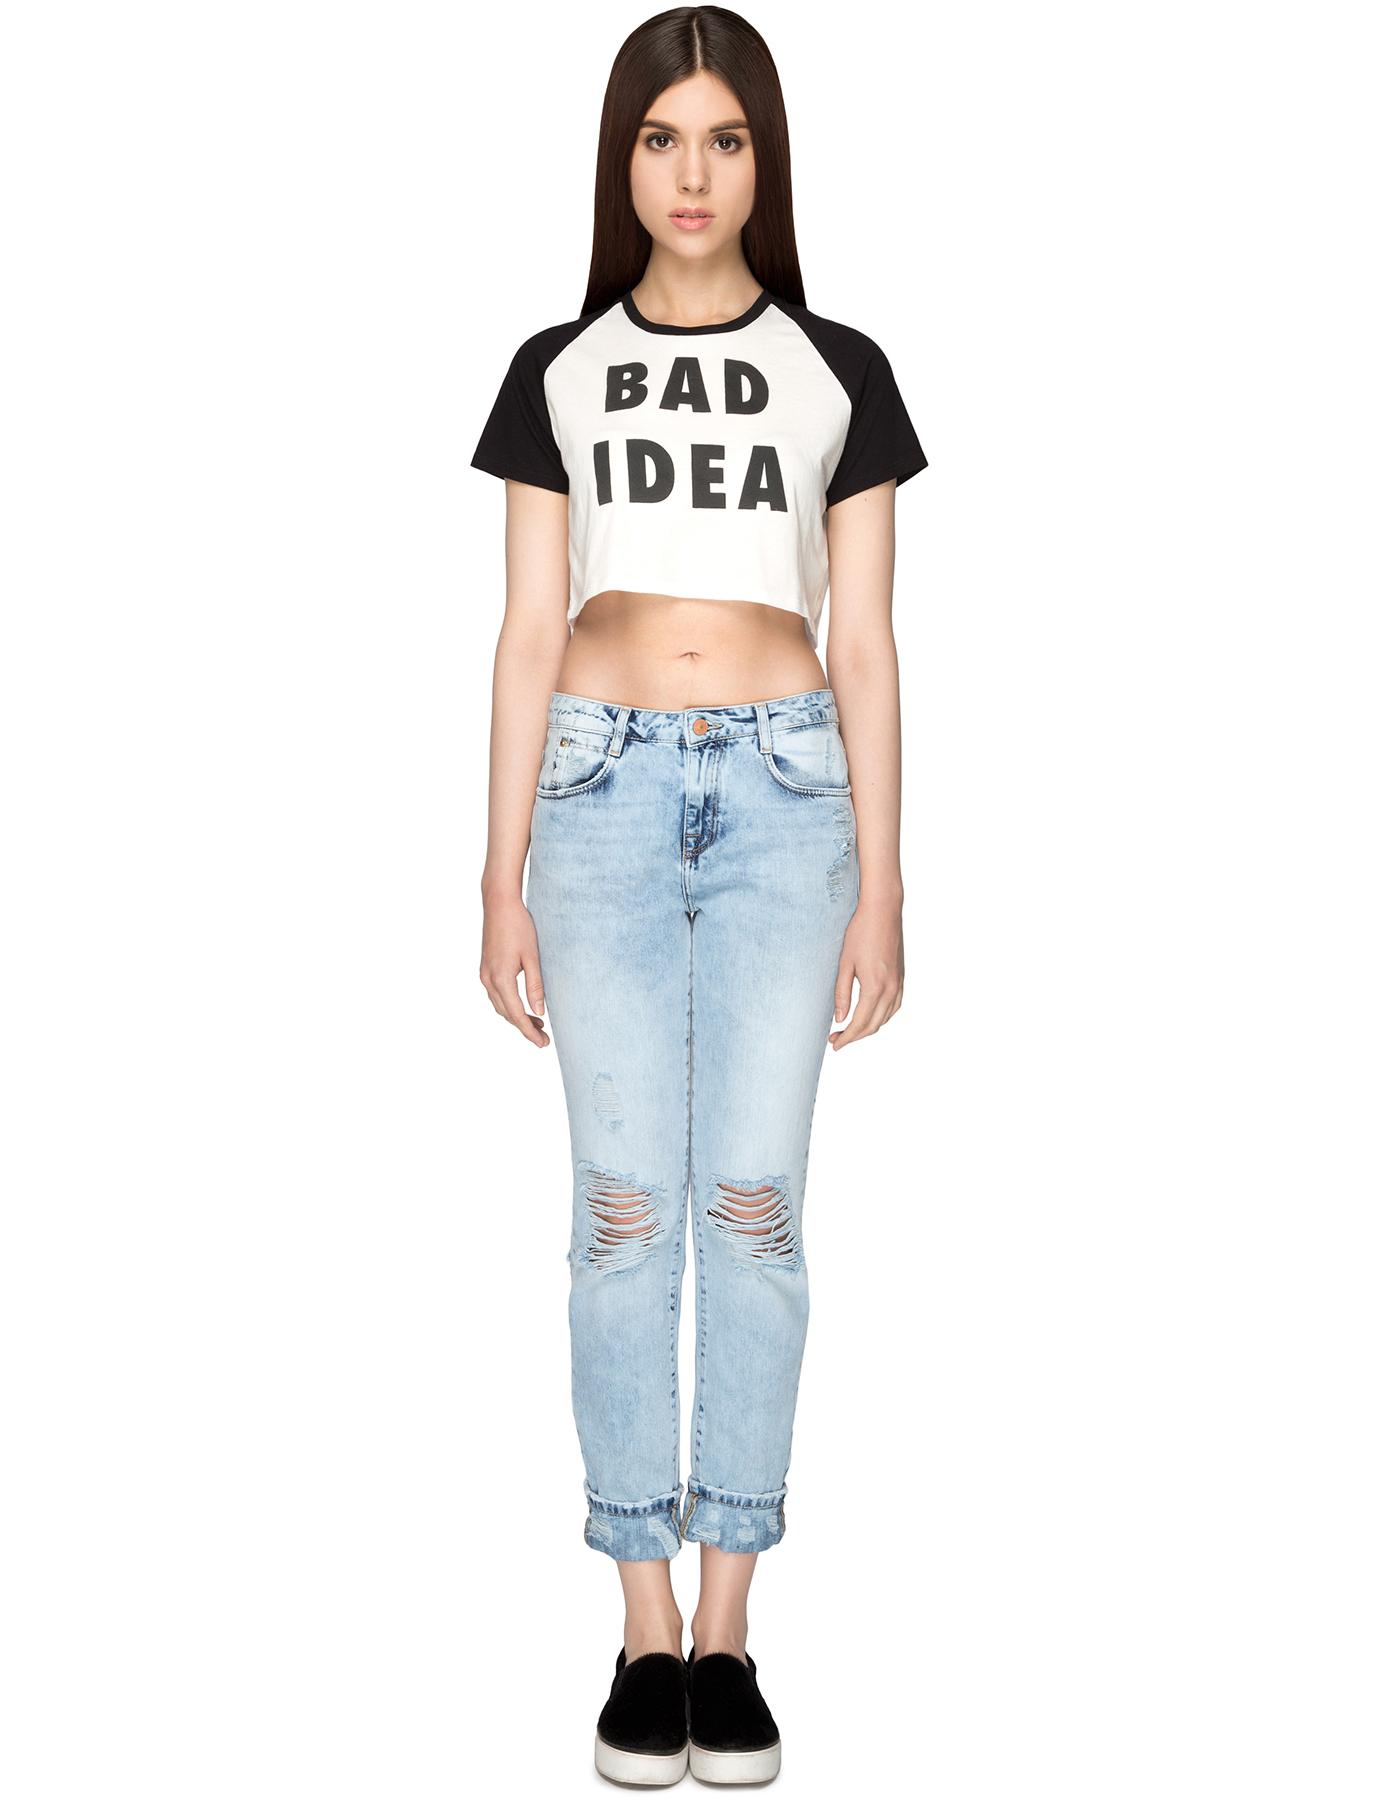 Lazy oaf black white bad idea crop t shirt hbx for Bad idee